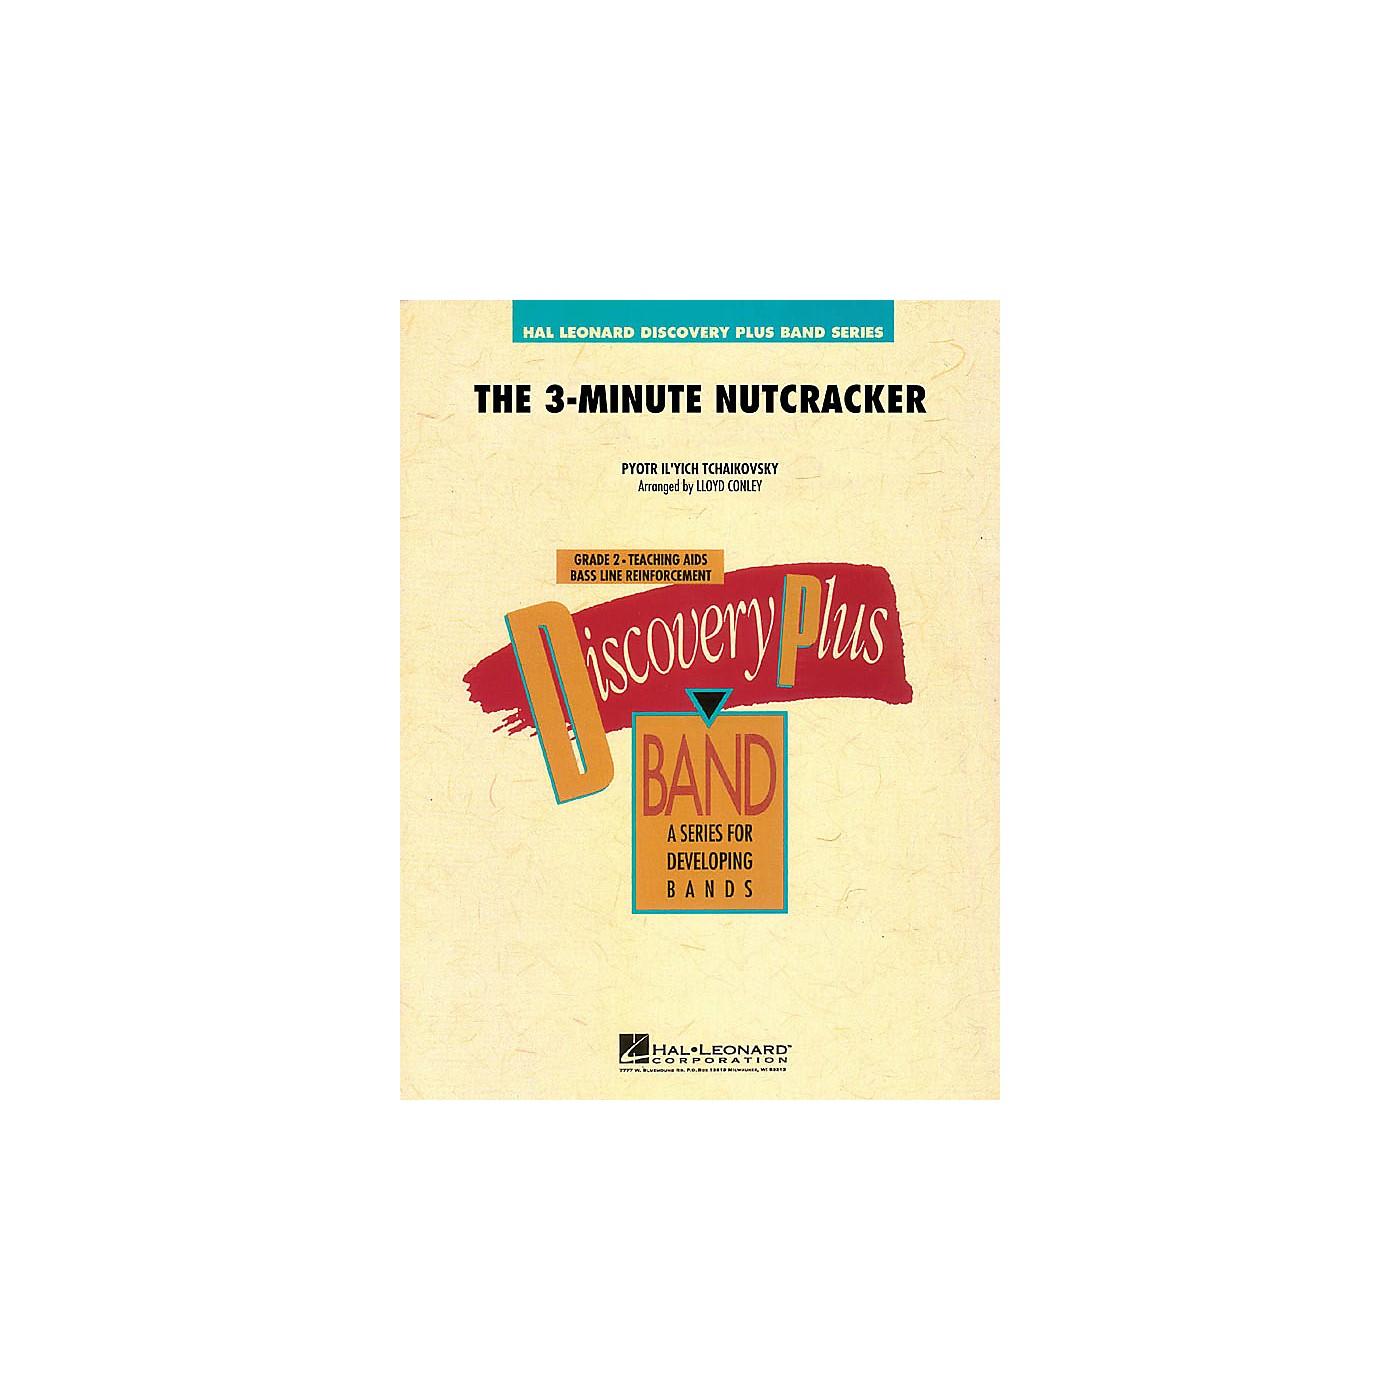 Hal Leonard The 3-Minute Nutcracker - Discovery Plus Band Level 2 arranged by Lloyd Conley thumbnail